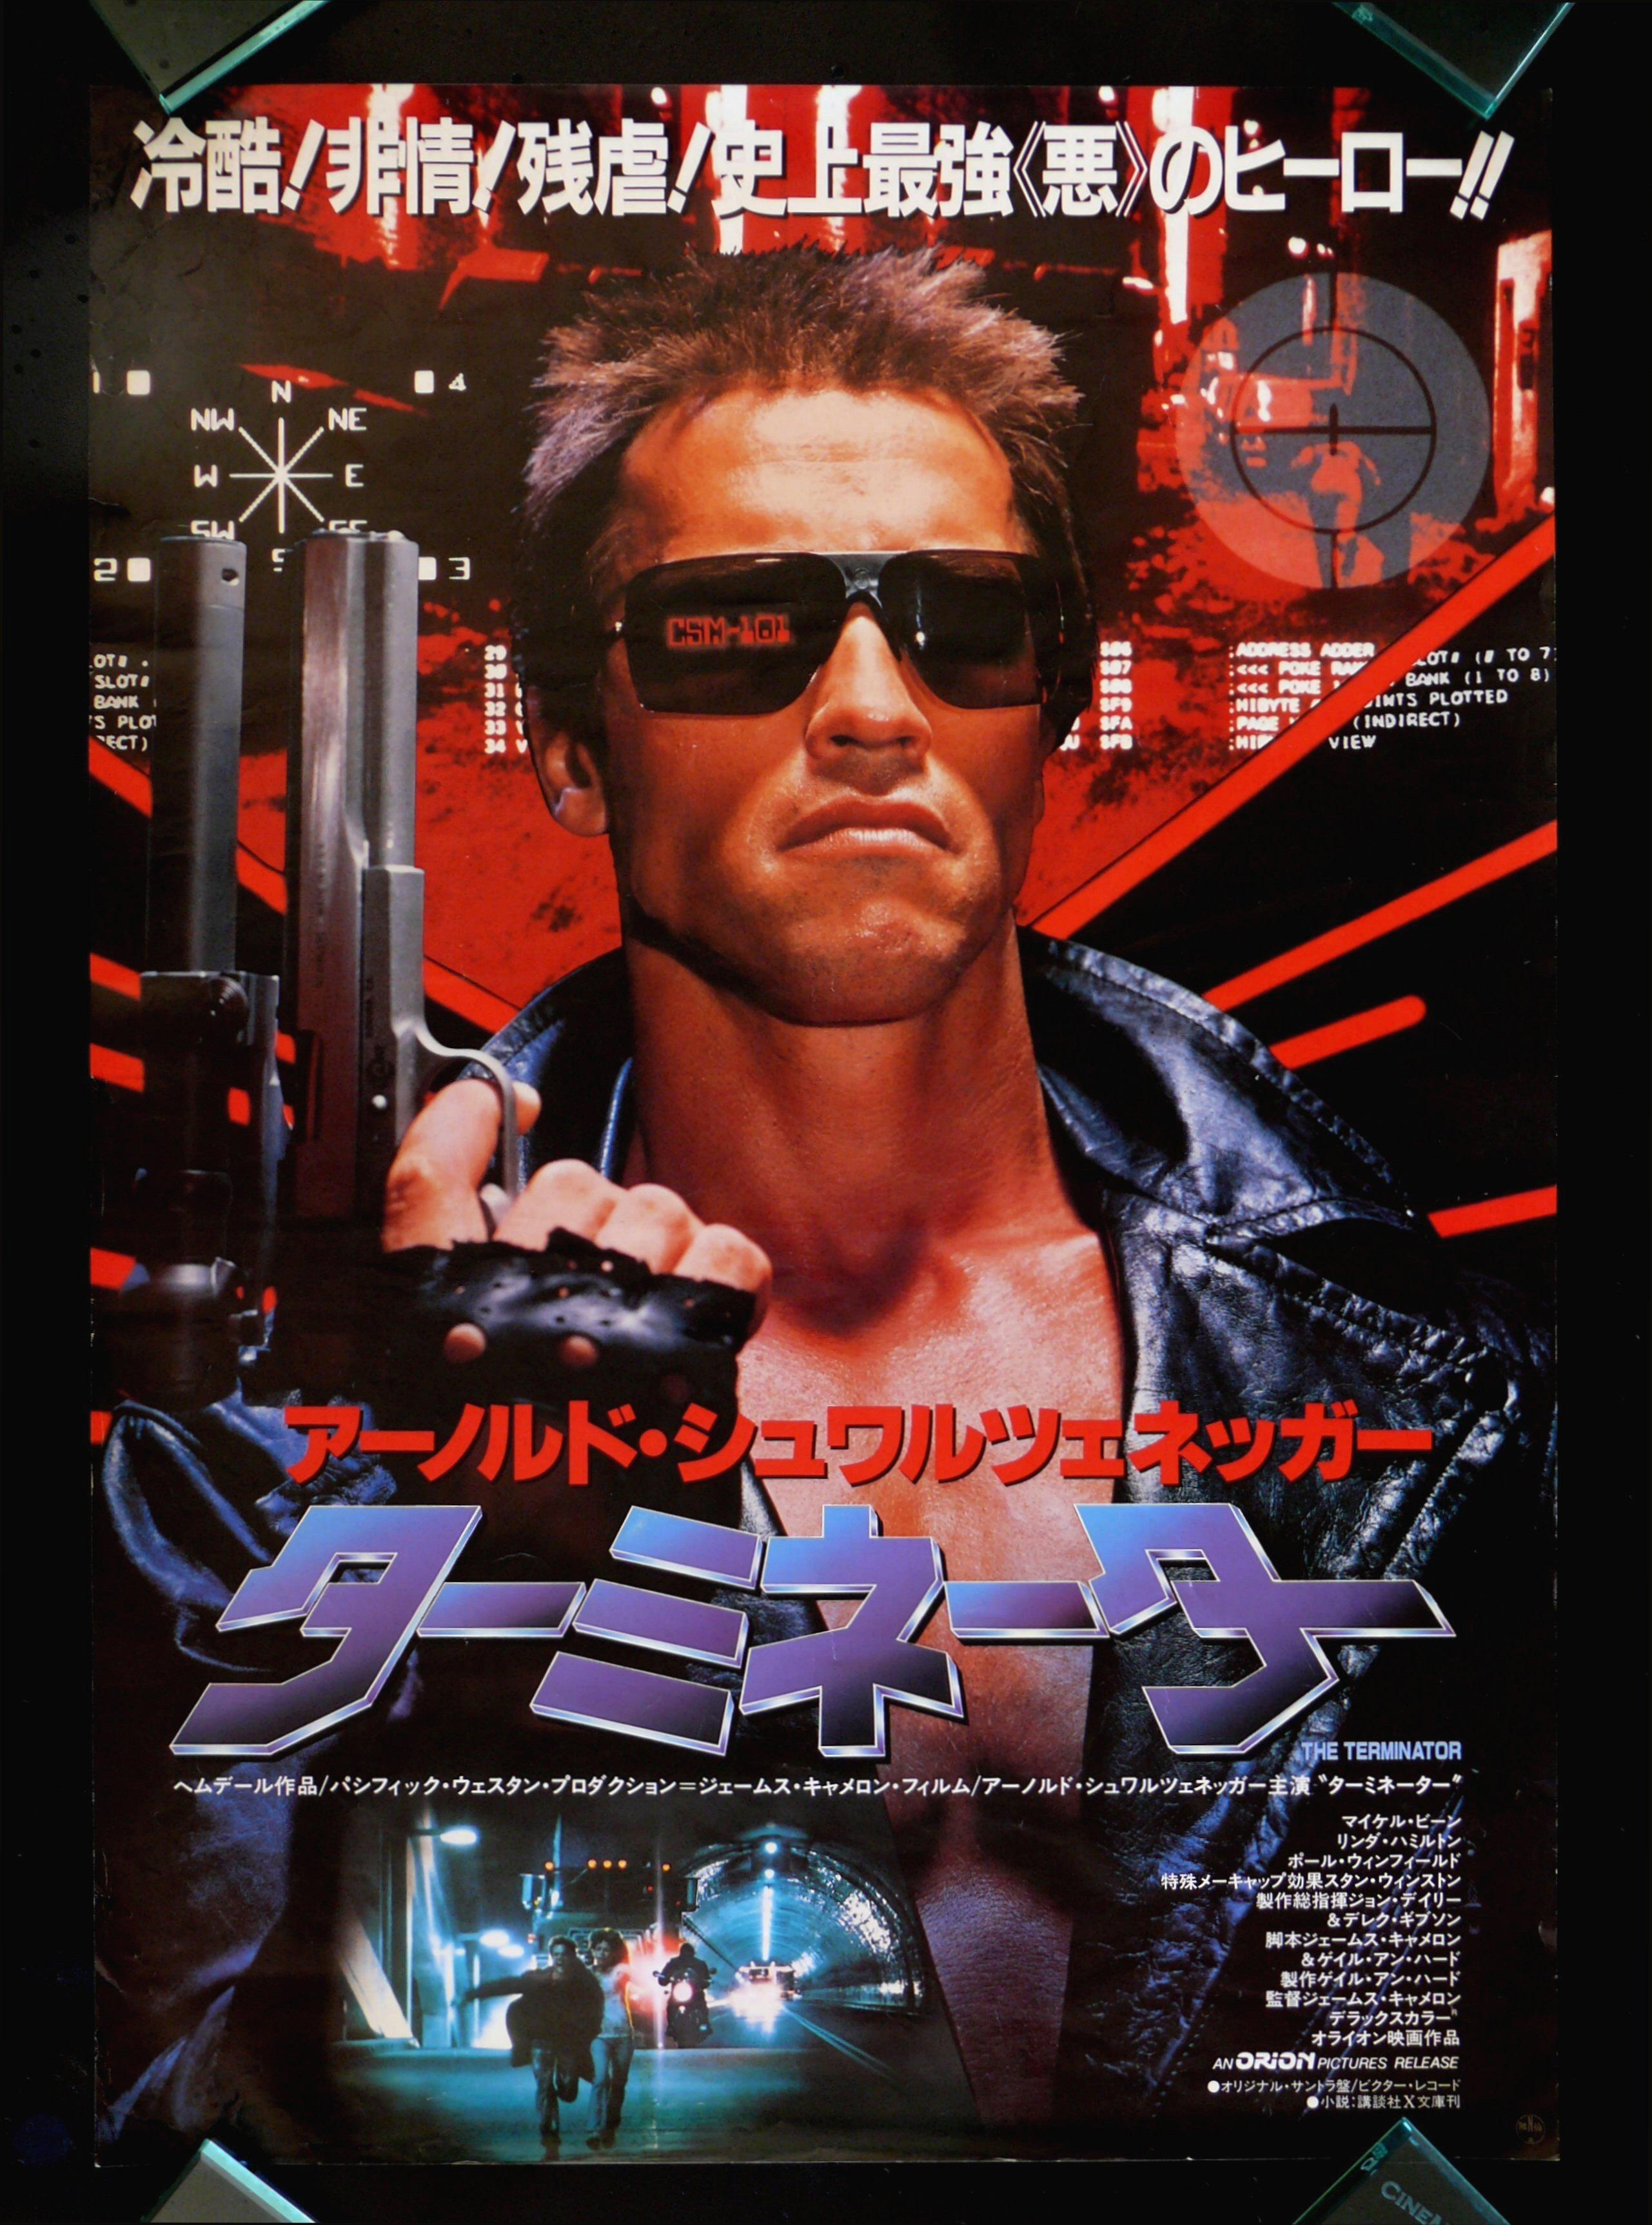 Taxi Driver Terminator Original Movie Posters Vintage Film ...